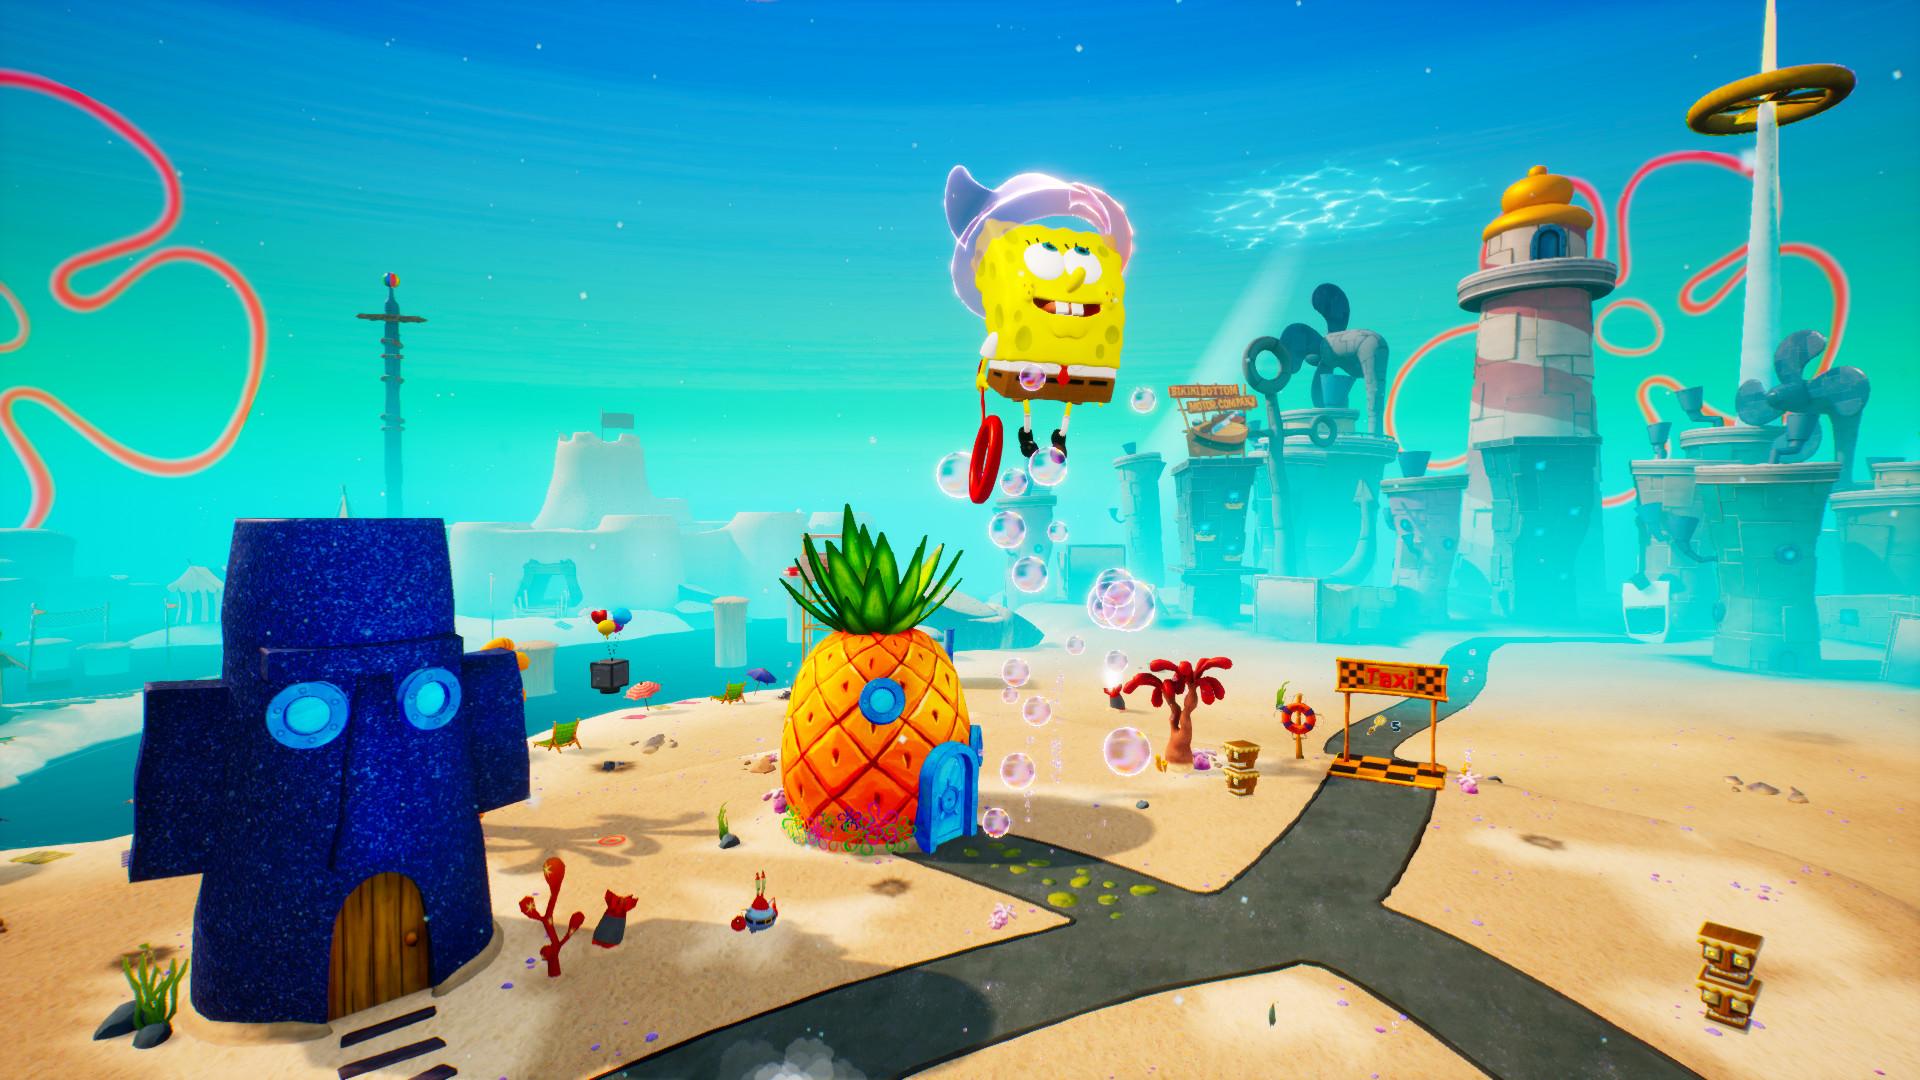 SpongeBob SquarePants 412021 2